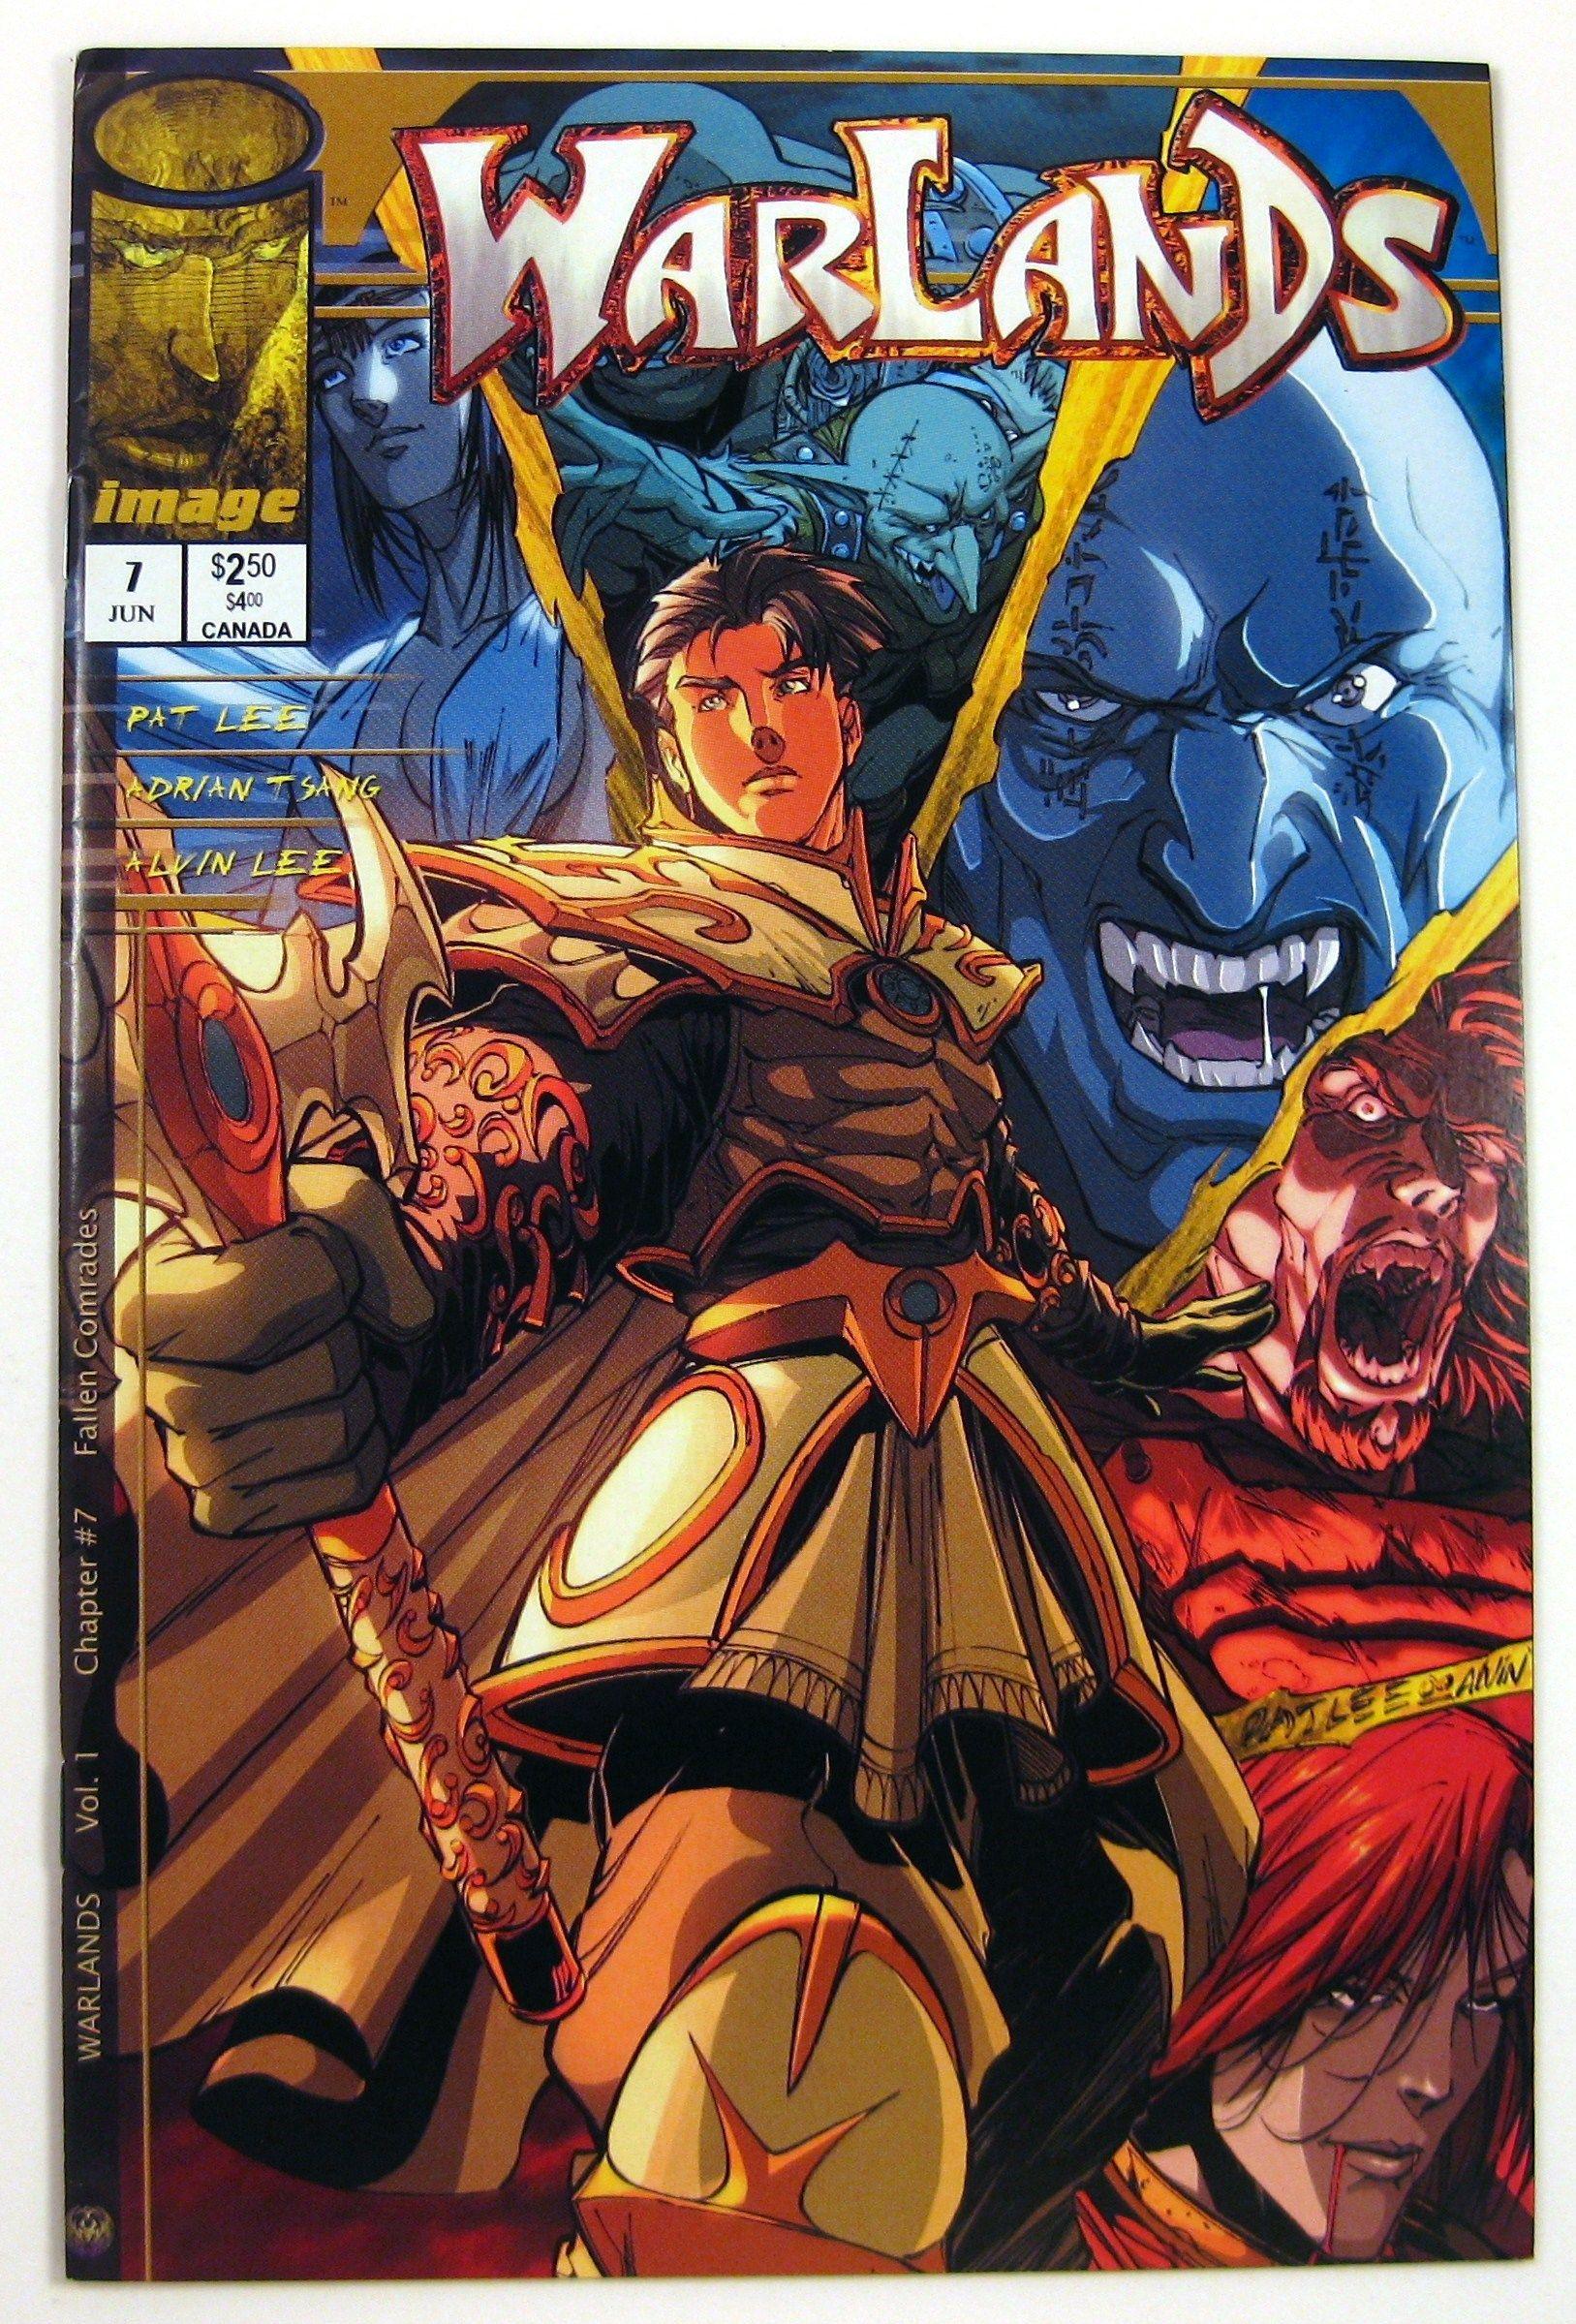 Warlands 7 Image Comics (2000) FREE Shipping Artist